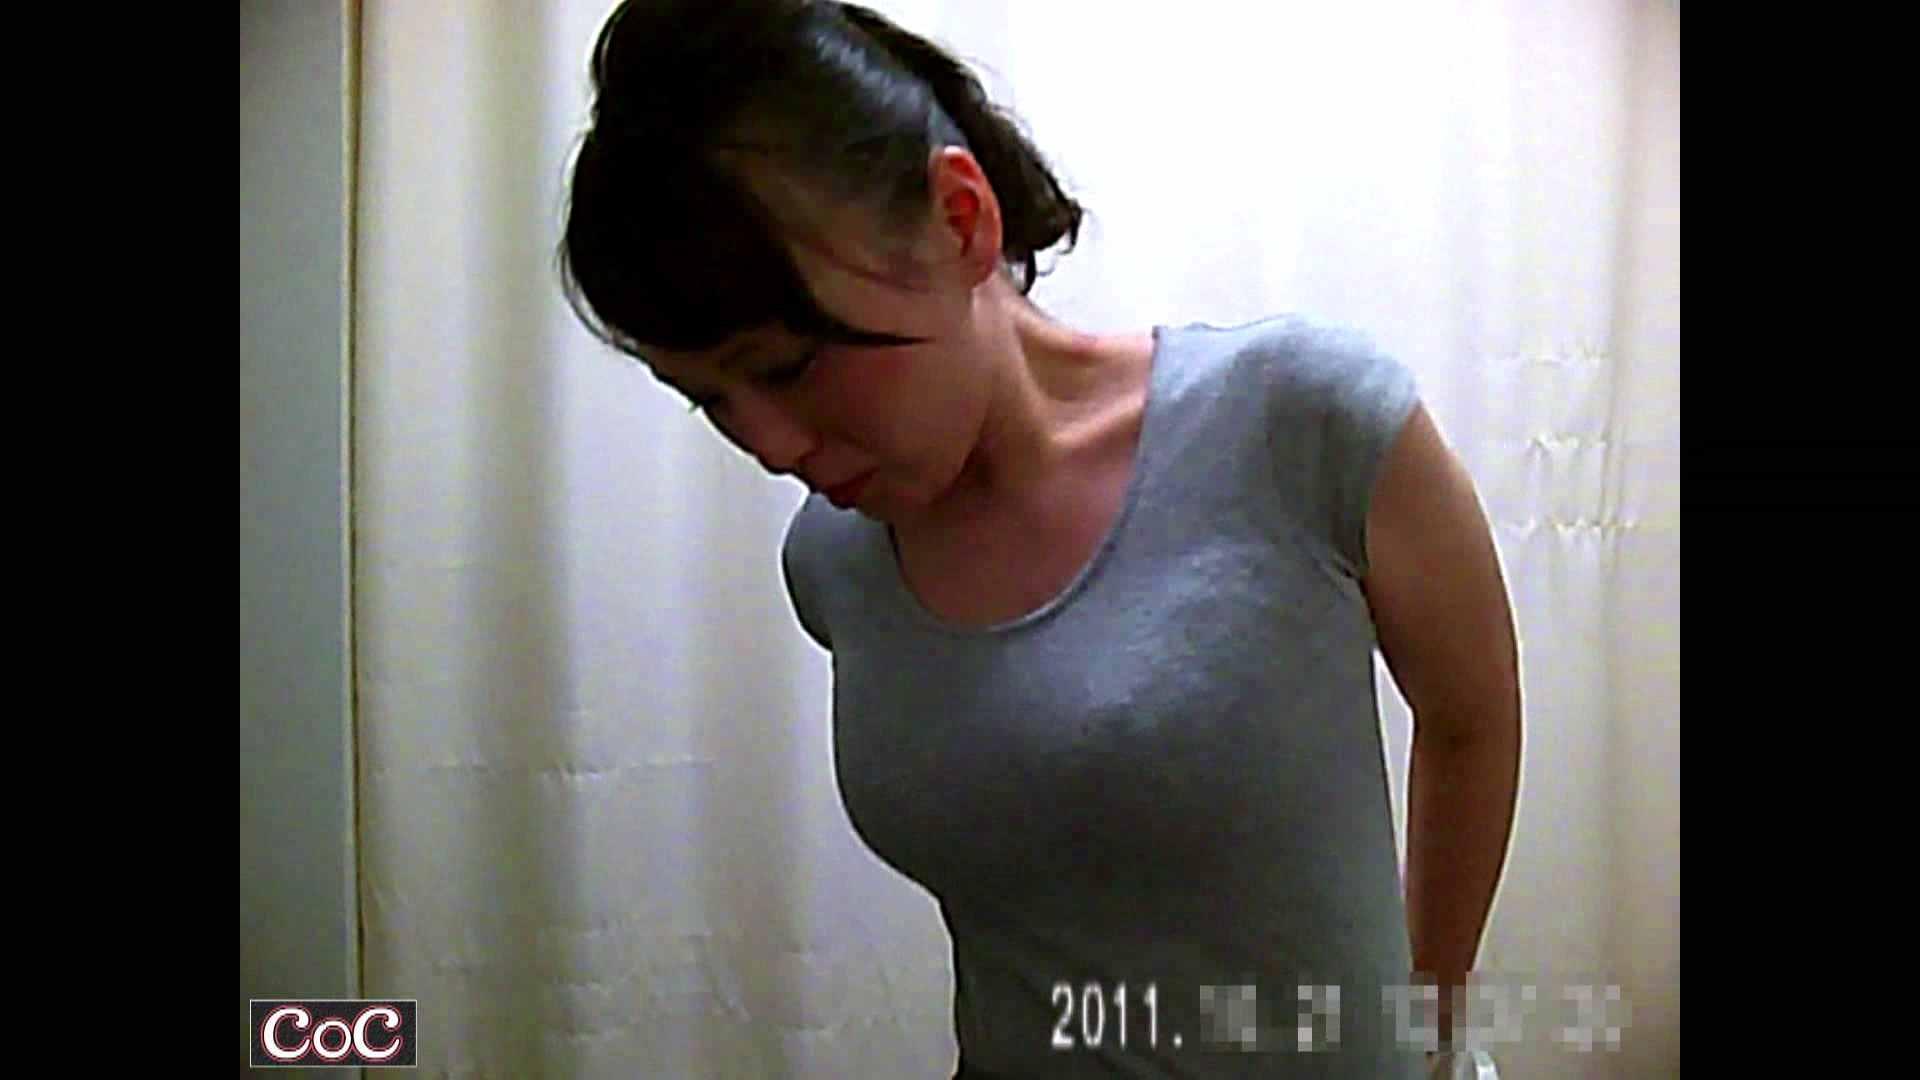 Doctor-X元医者による反抗vol.67 OL  53pic 44